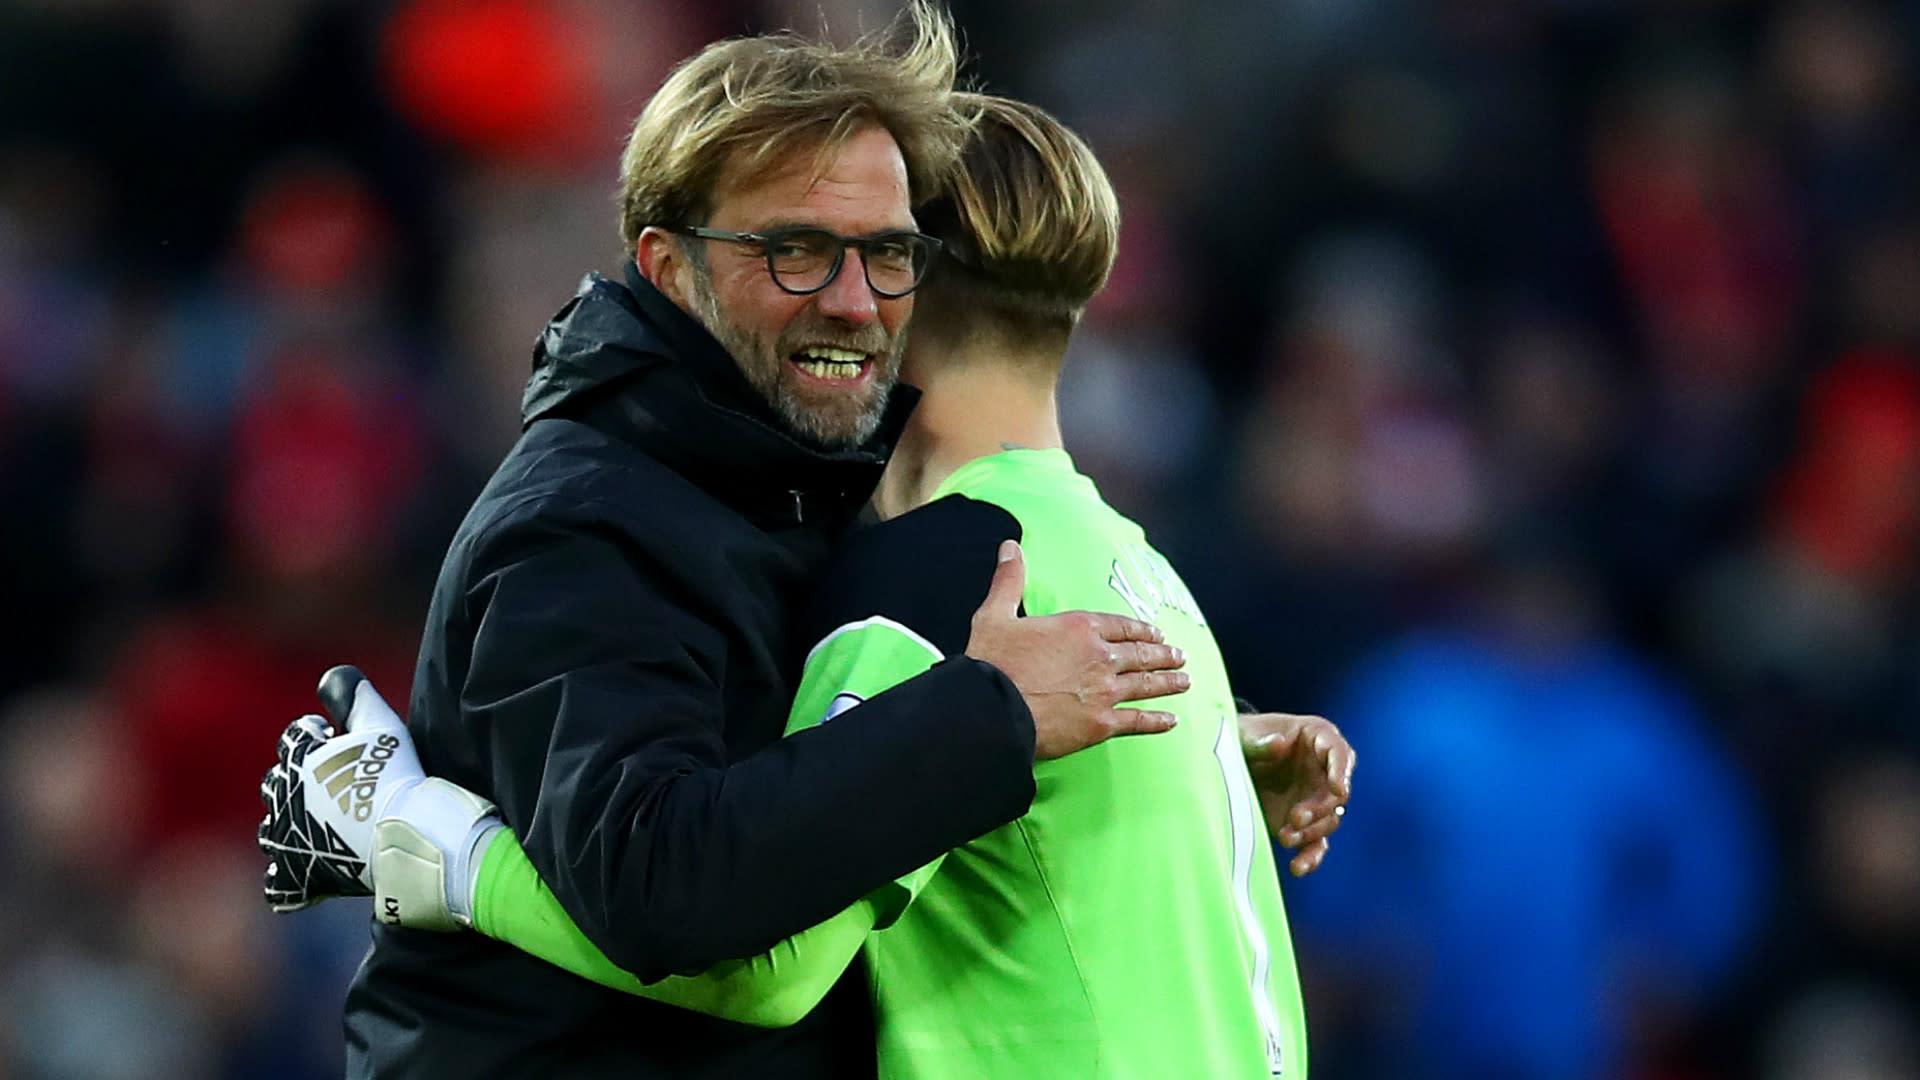 Jurgen Klopp And Loris Karius Have Given Liverpool An